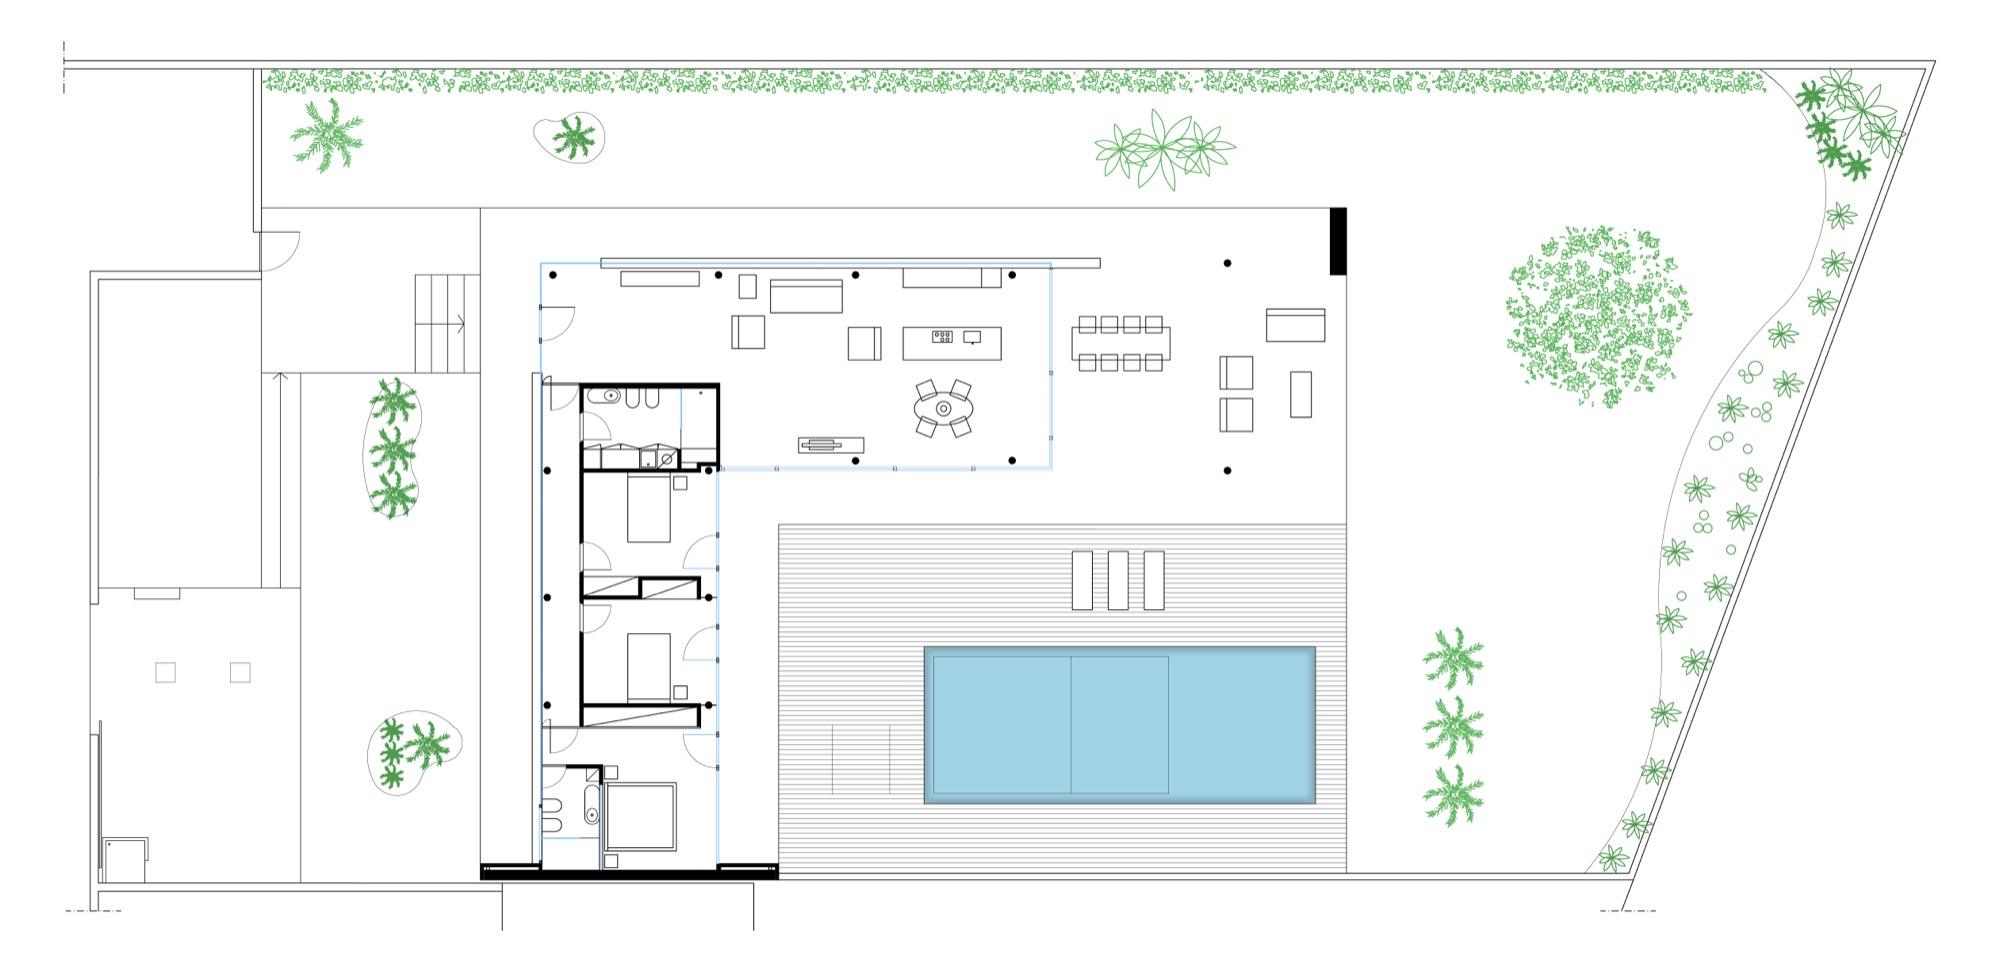 Extraordinary Stahl House Floor Plan Gallery